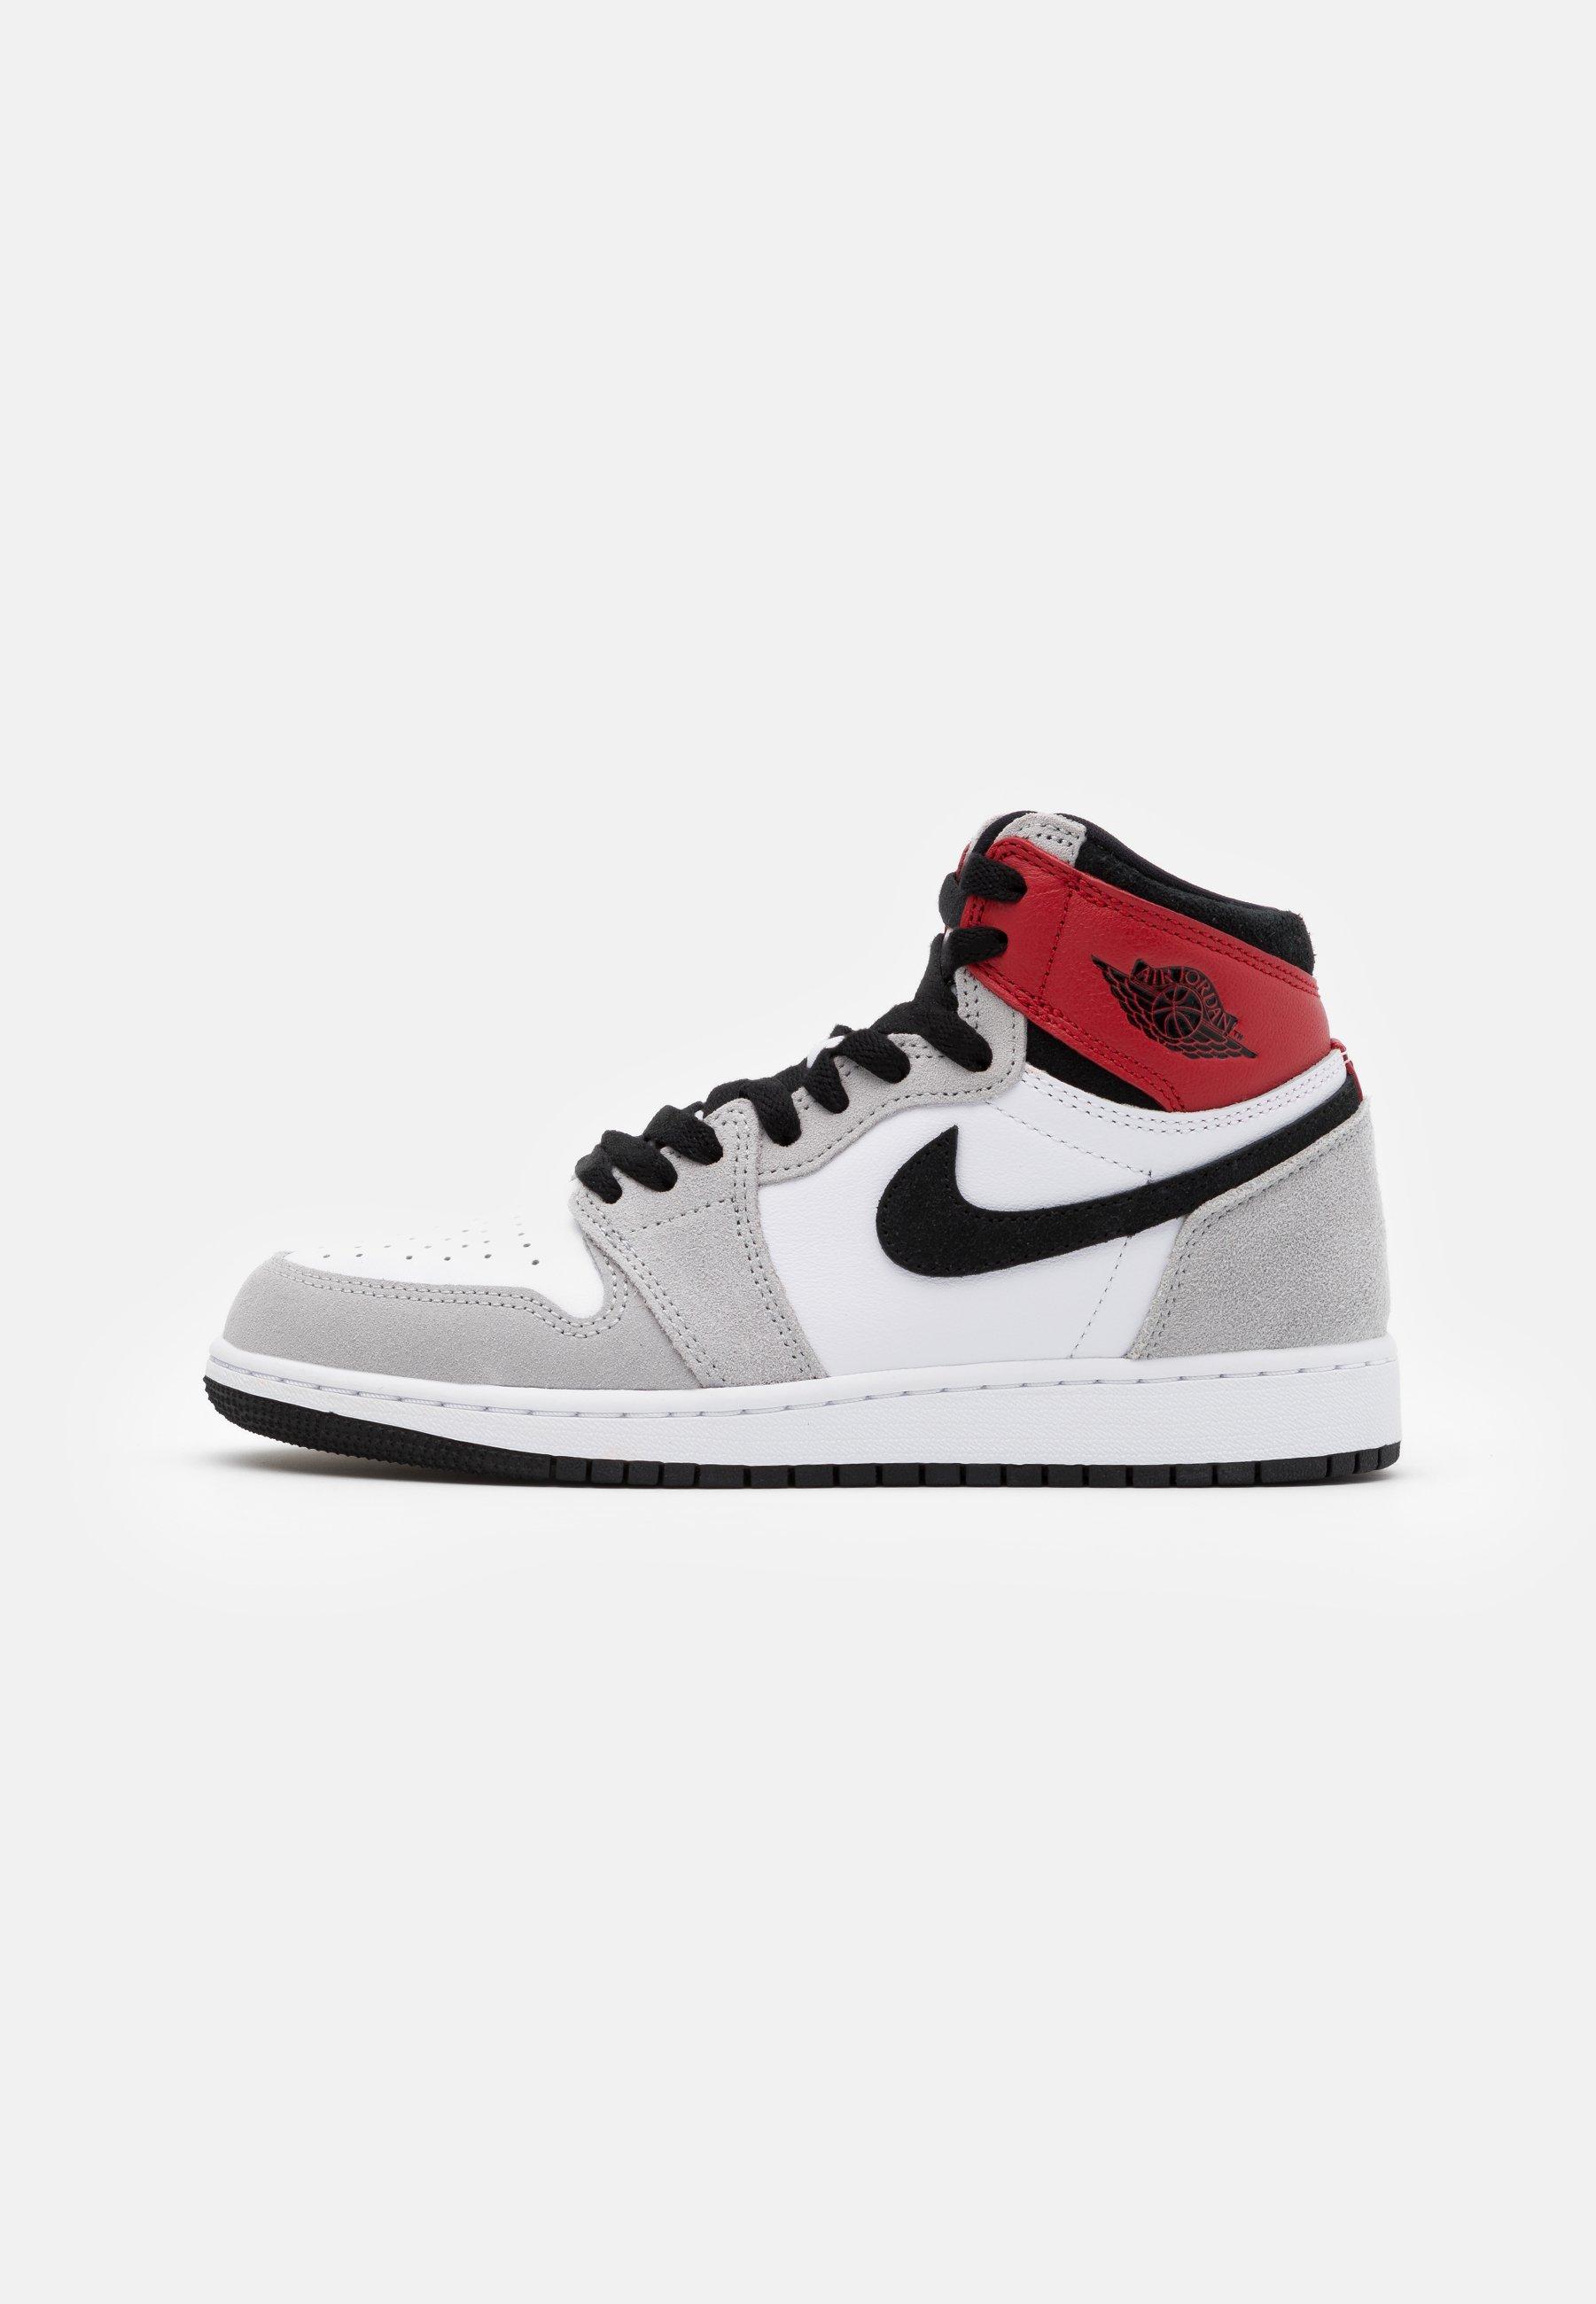 Jordan AIR JORDAN 1 BLOODLINE - Basketball shoes - grey/red ...